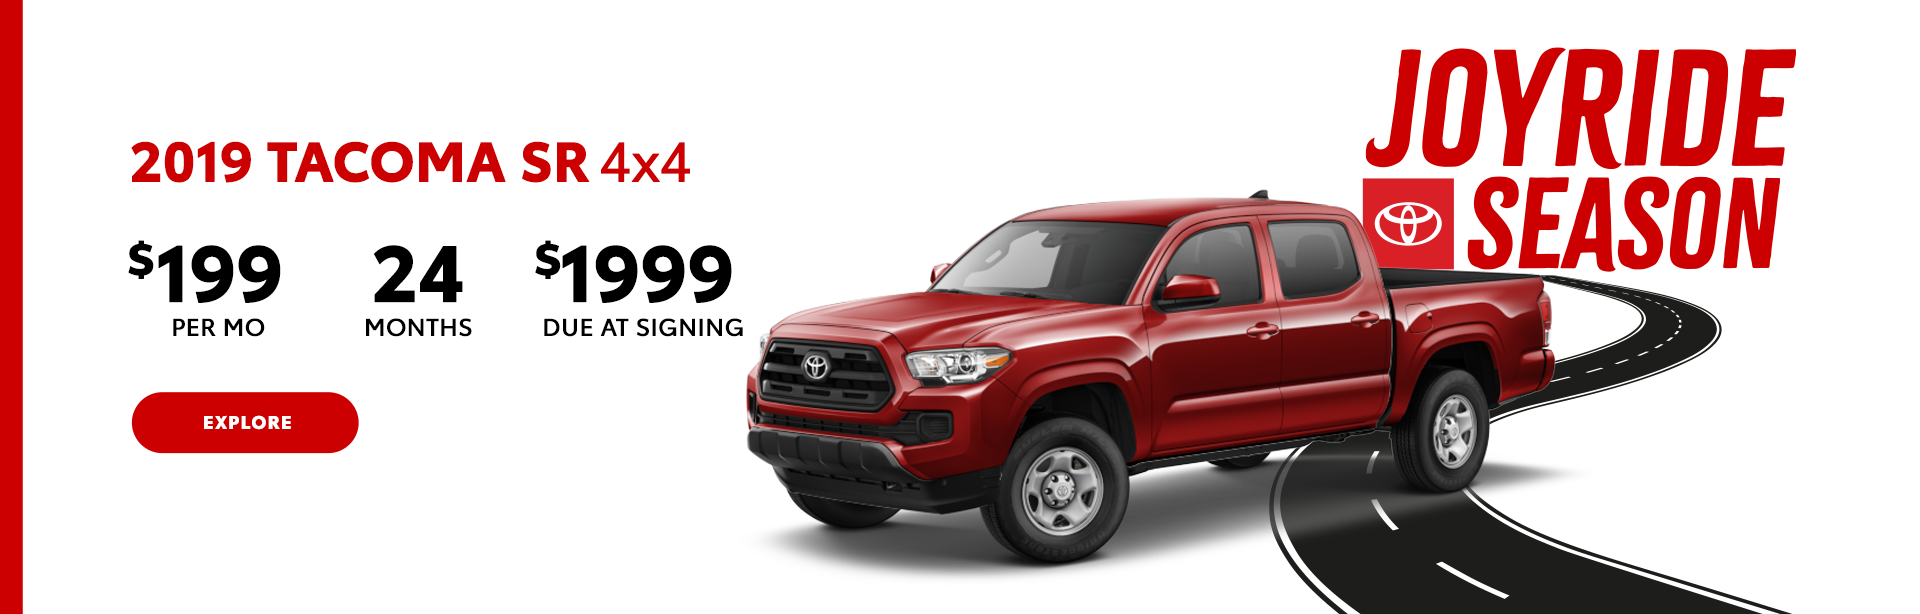 Toyota Dealership Dayton Ohio >> Walker Toyota Toyota Dealer In Miamisburg Oh